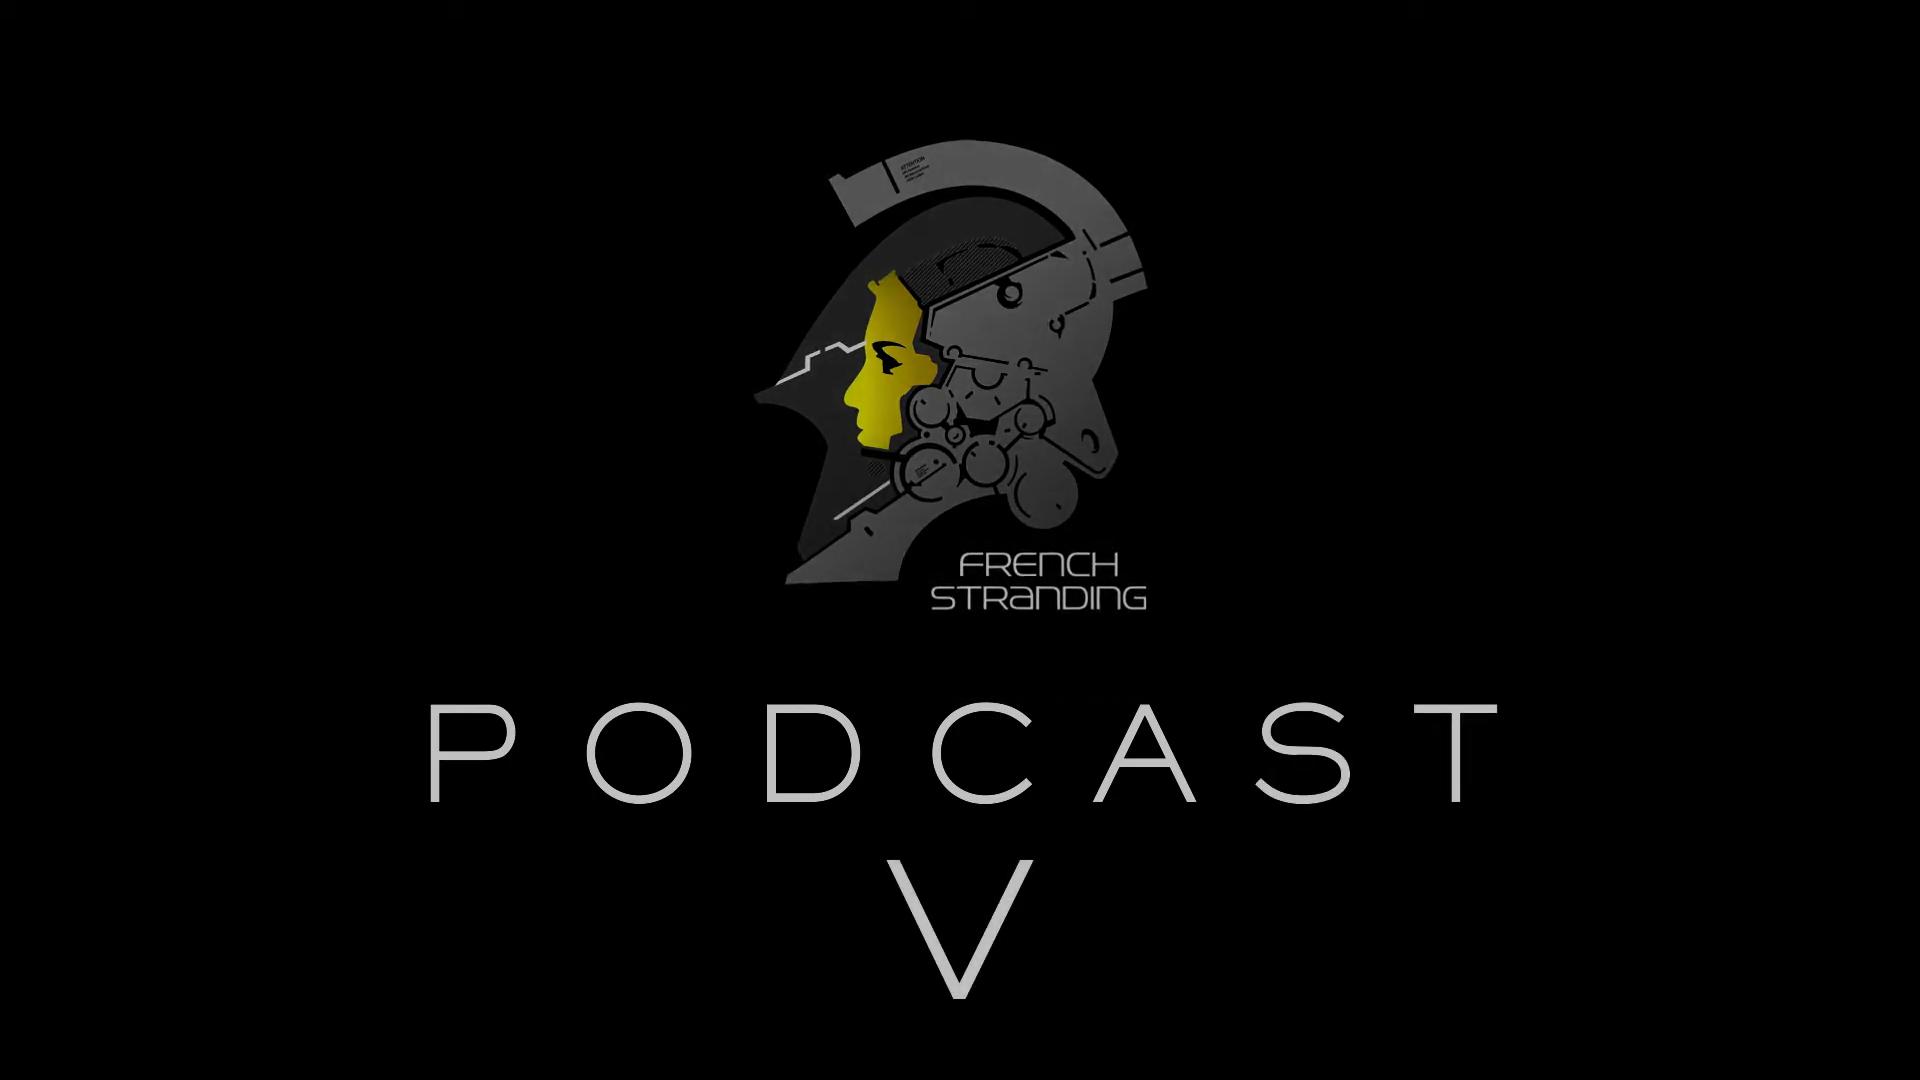 French_Stranding_Podcast_V